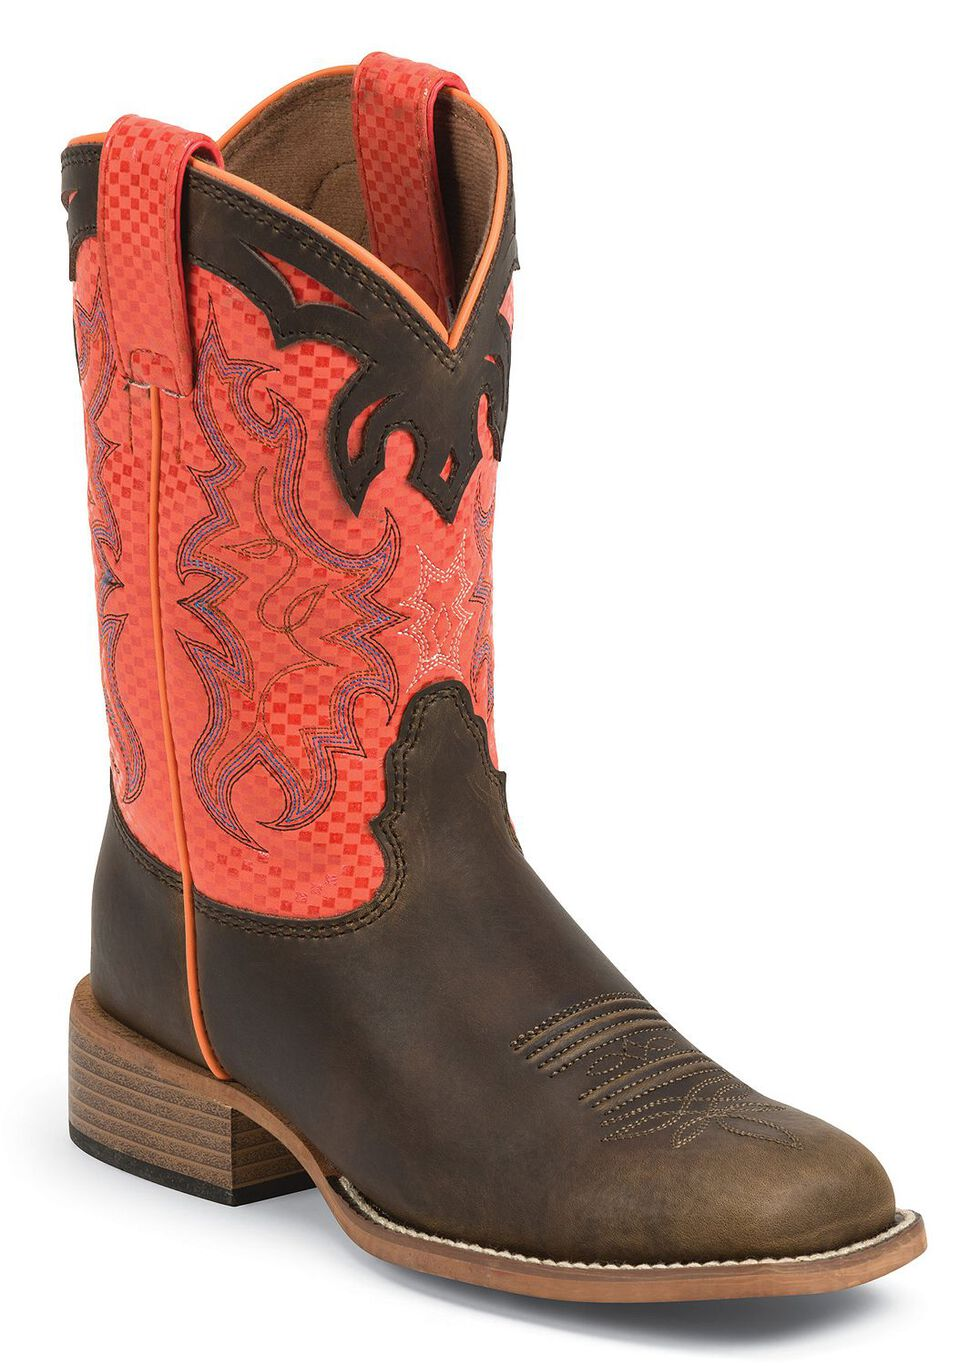 Justin Bent Rail Kids' Orange Diamond Apache Cowboy Boots - Square Toe, Dark Brown, hi-res